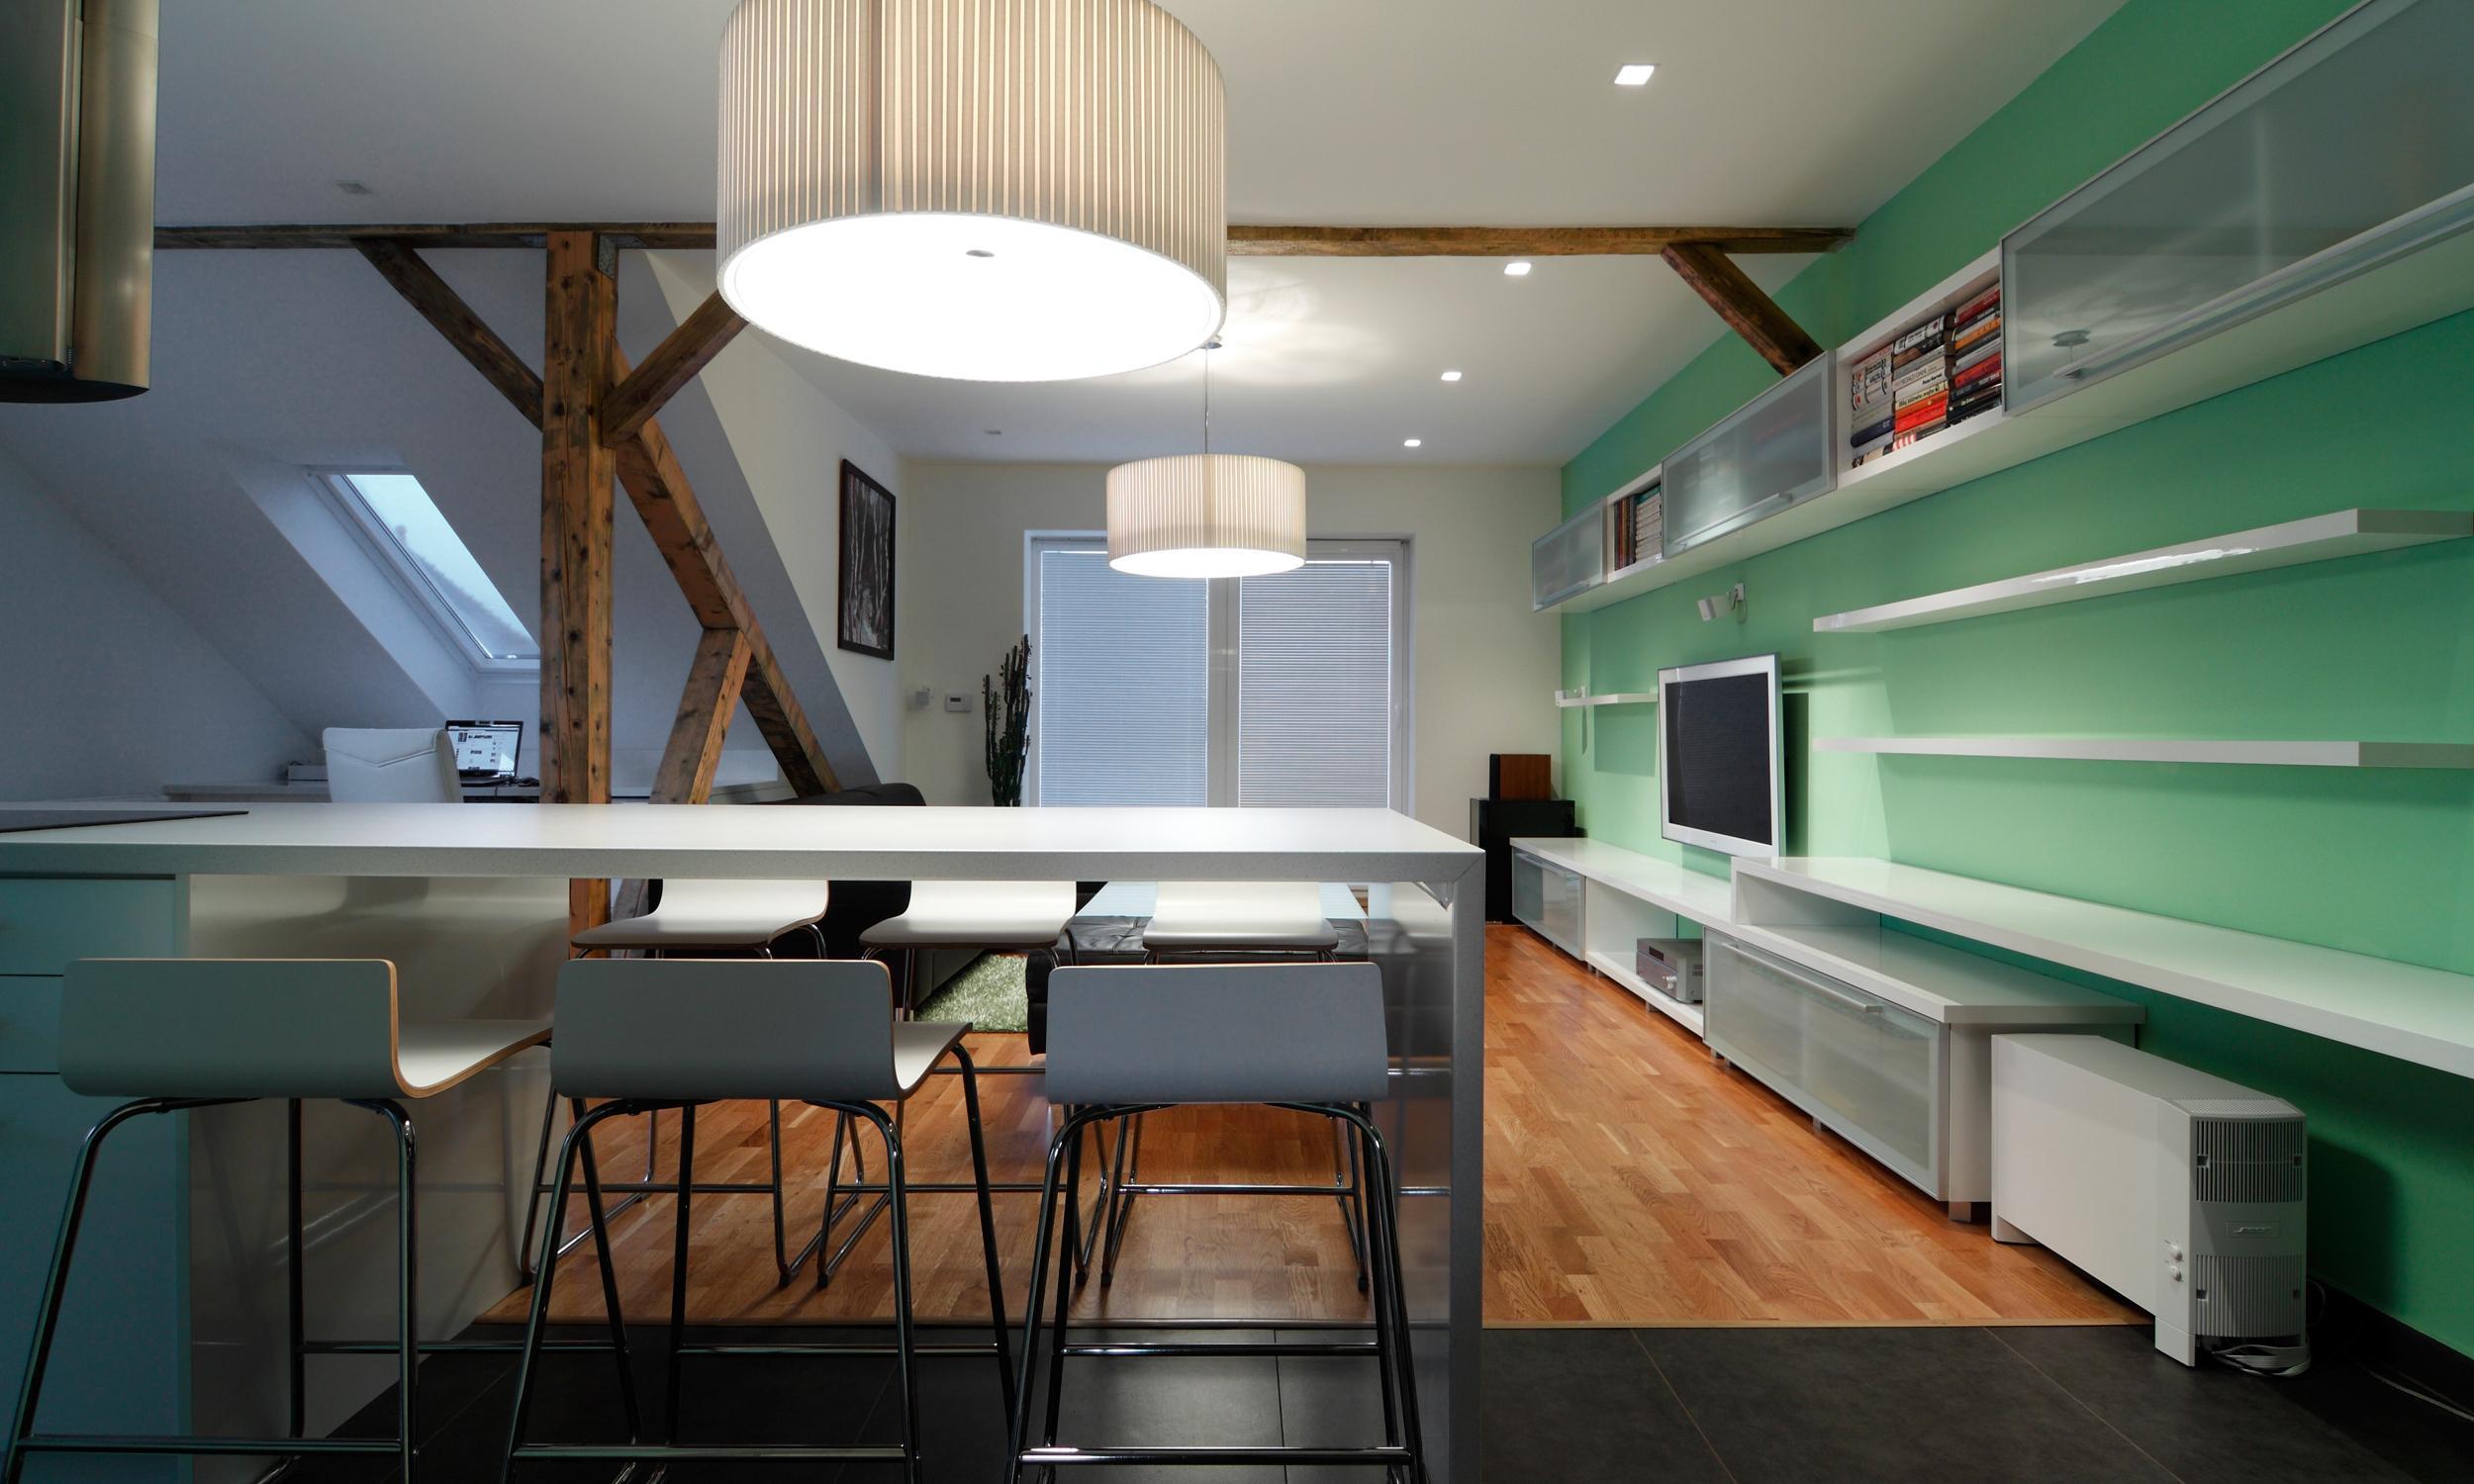 Dachwohnung, Bratislava, Slowakei | RULES Architekten